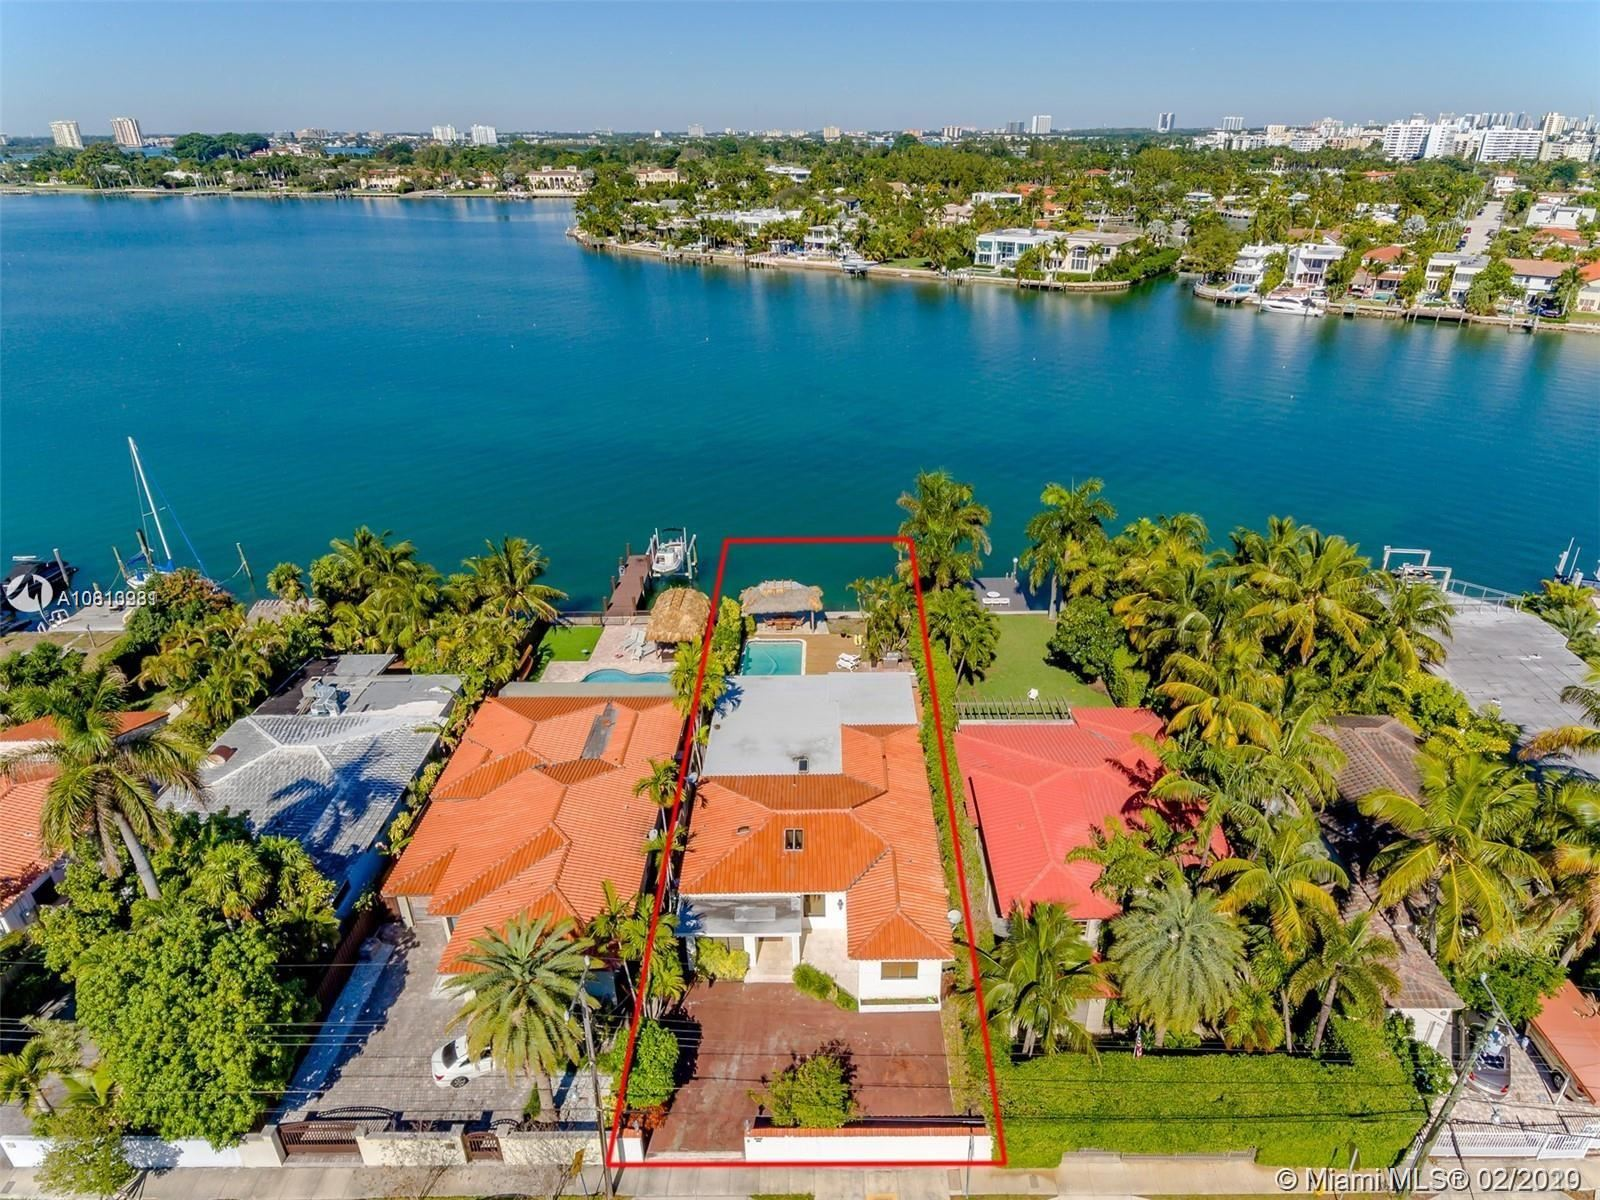 901 Stillwater Dr, Miami Beach, FL 33141 - #: A10813981